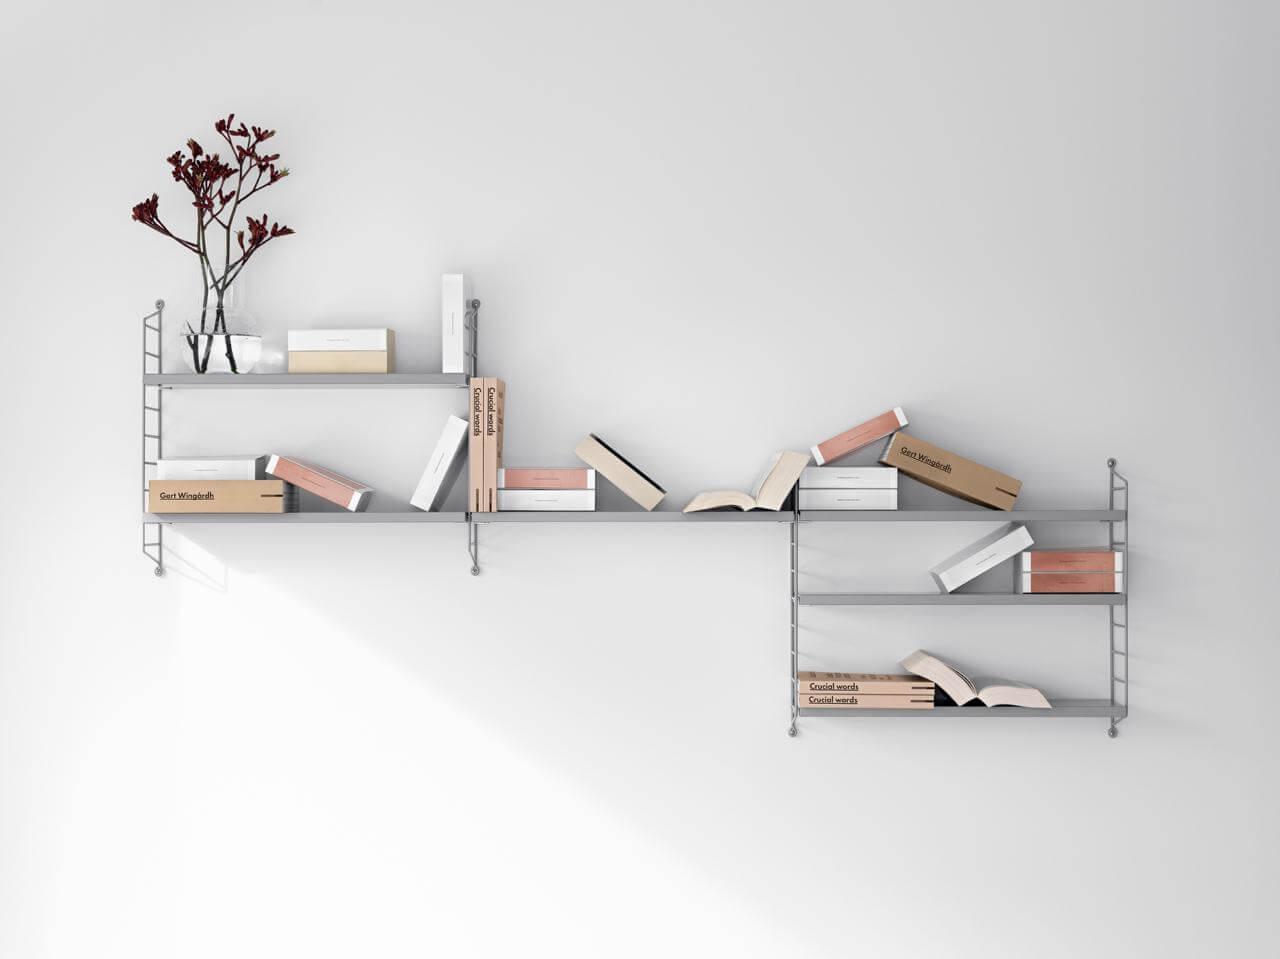 buecherregale-inspiration-ideen-bookshelf-strimg-poket-decohome.de_